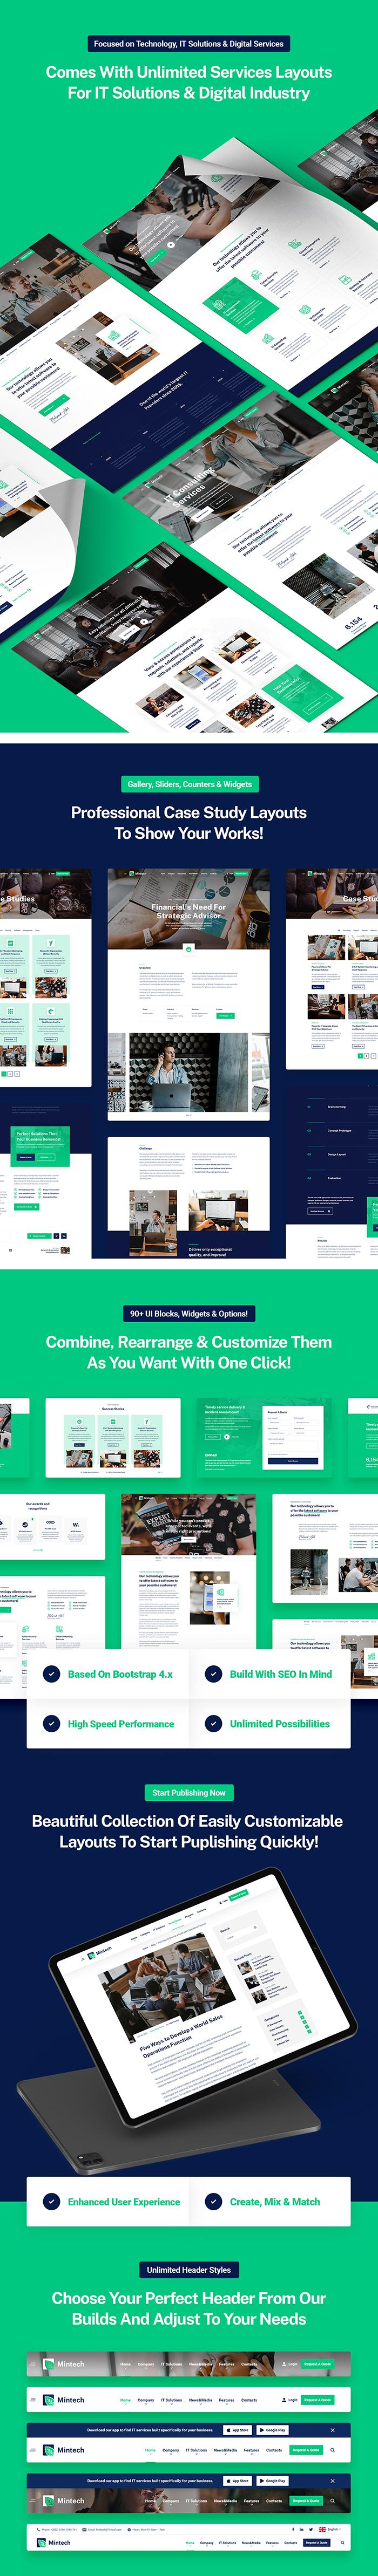 Mintech - IT Solutions & Services HTML5 Template - 6